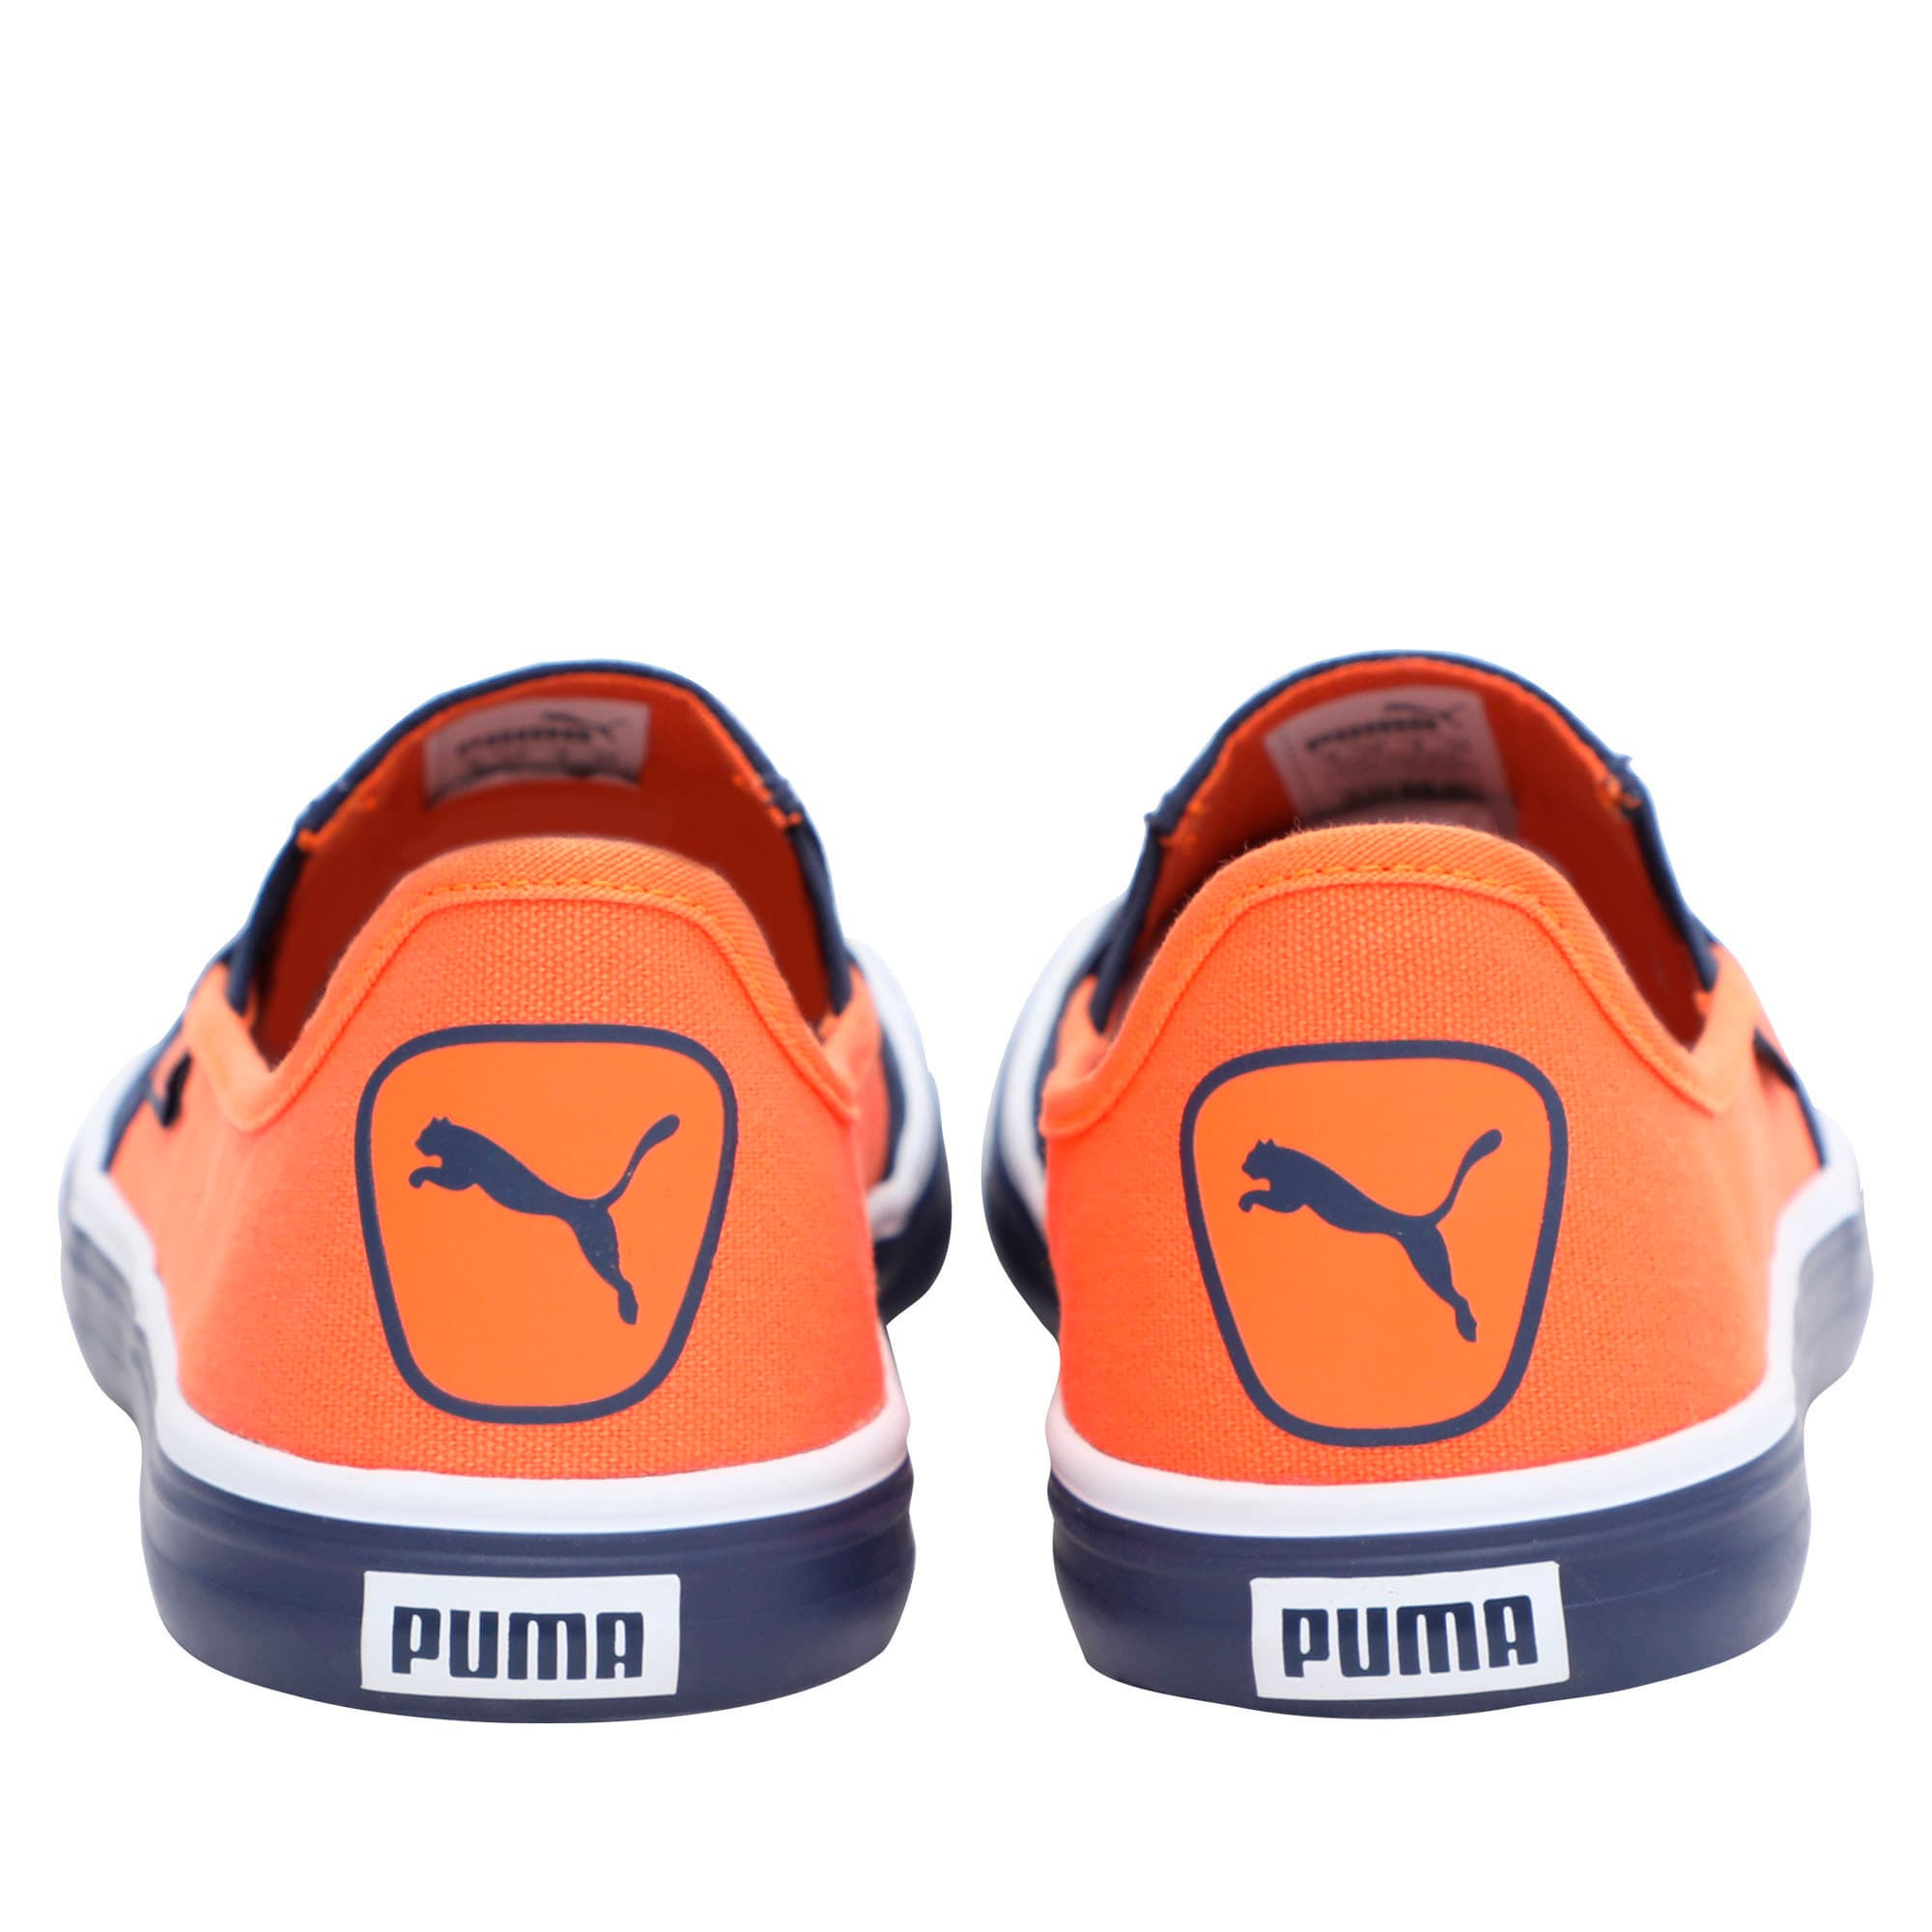 Thumbnail 4 of Apollo Slip On IDP Peacoat-Sodalite Blue, Peacoat-Vibrant Orange, medium-IND